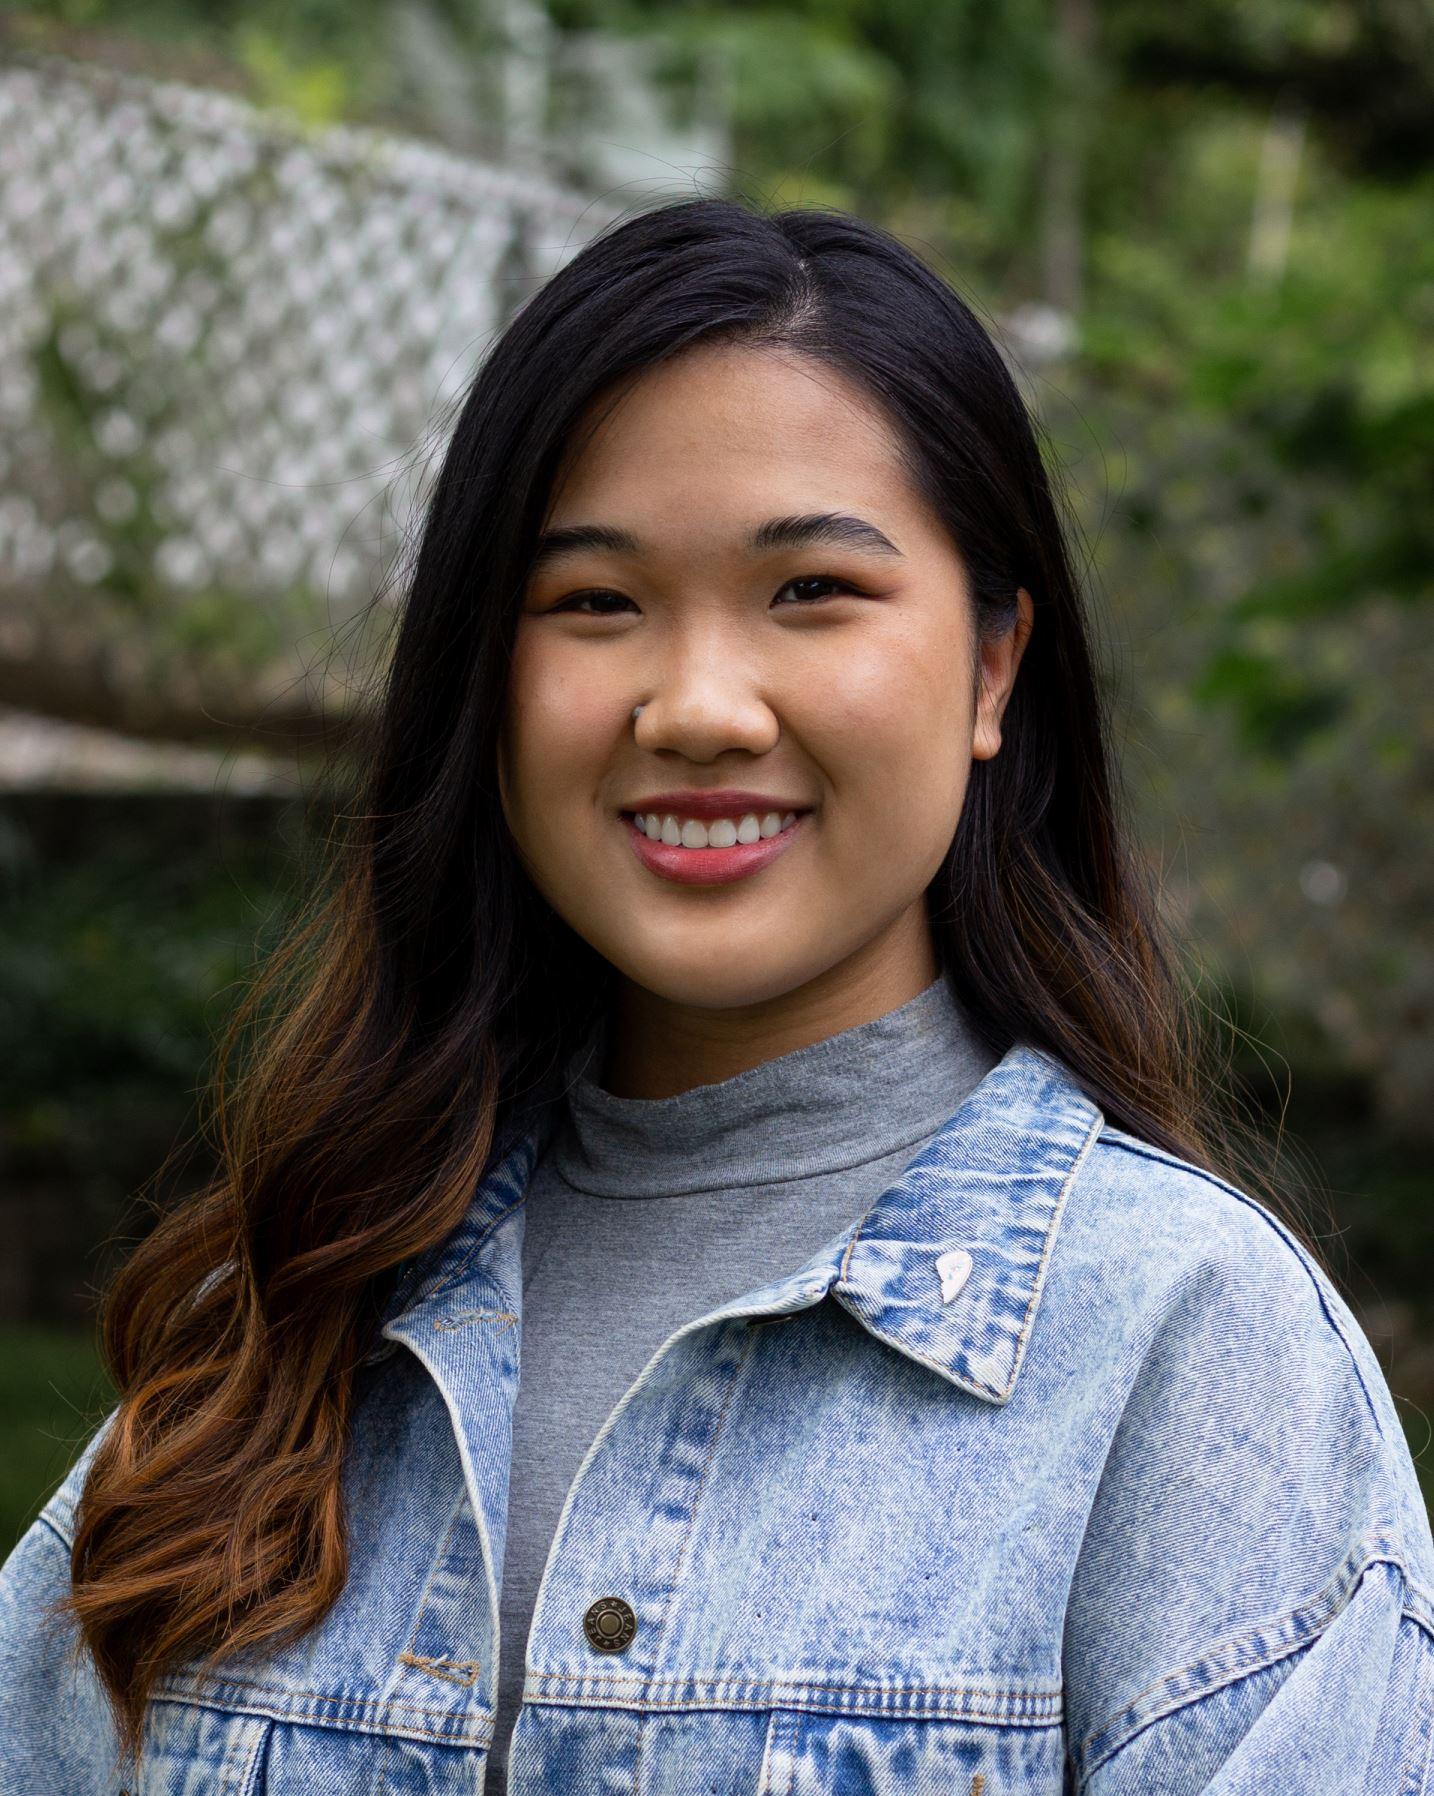 A headshot of Stephanie Chan.